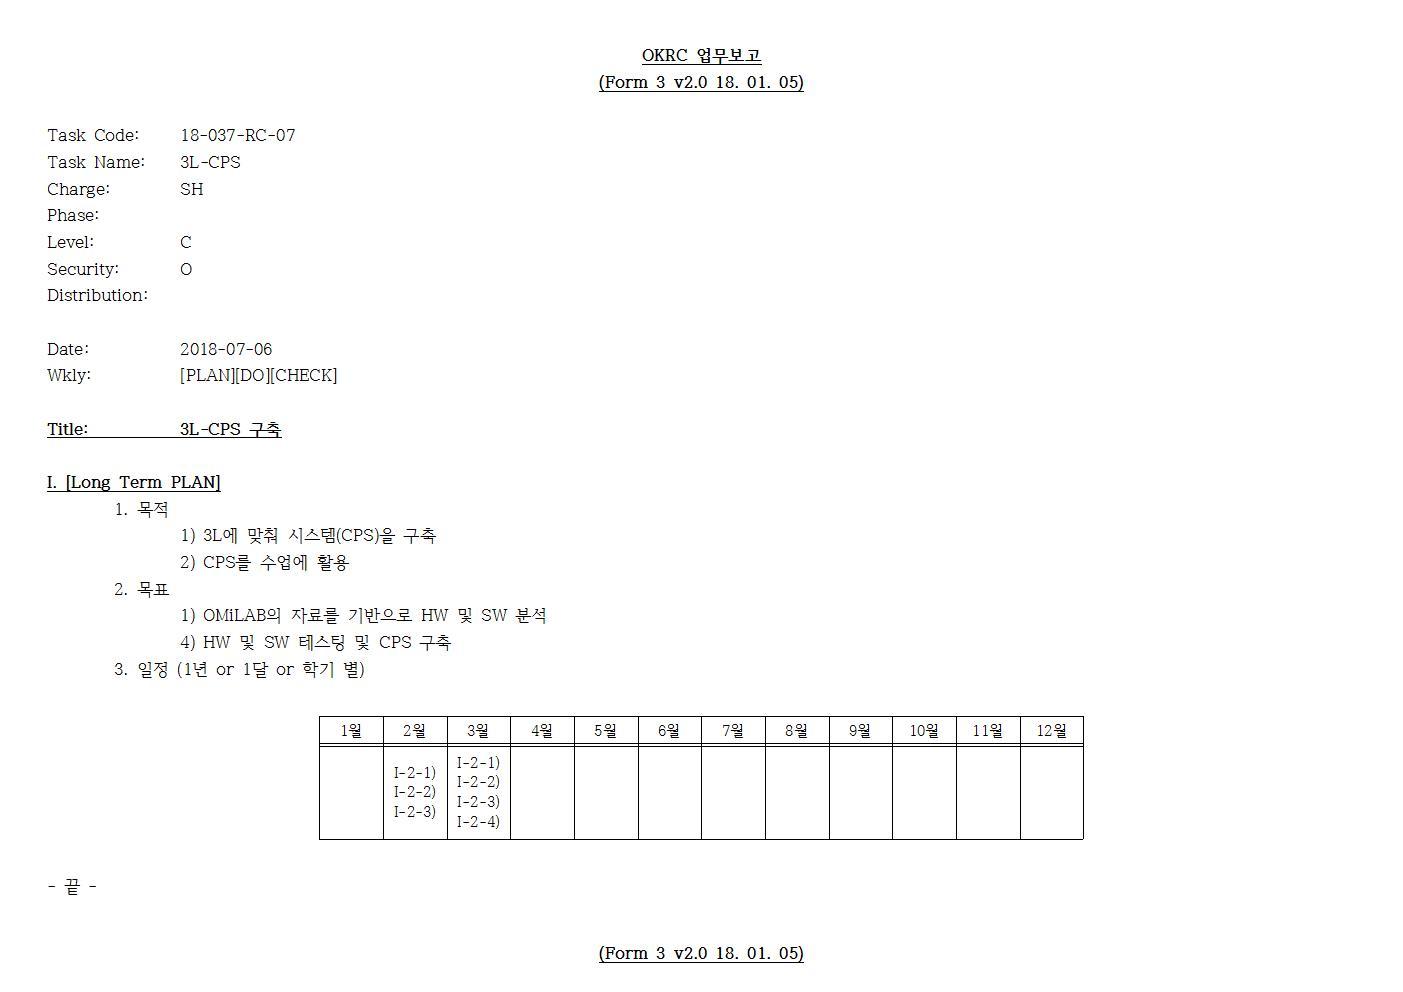 D-[18-037-RC-07]-[3L-CPS]-[2018-07-06][SH]001.jpg